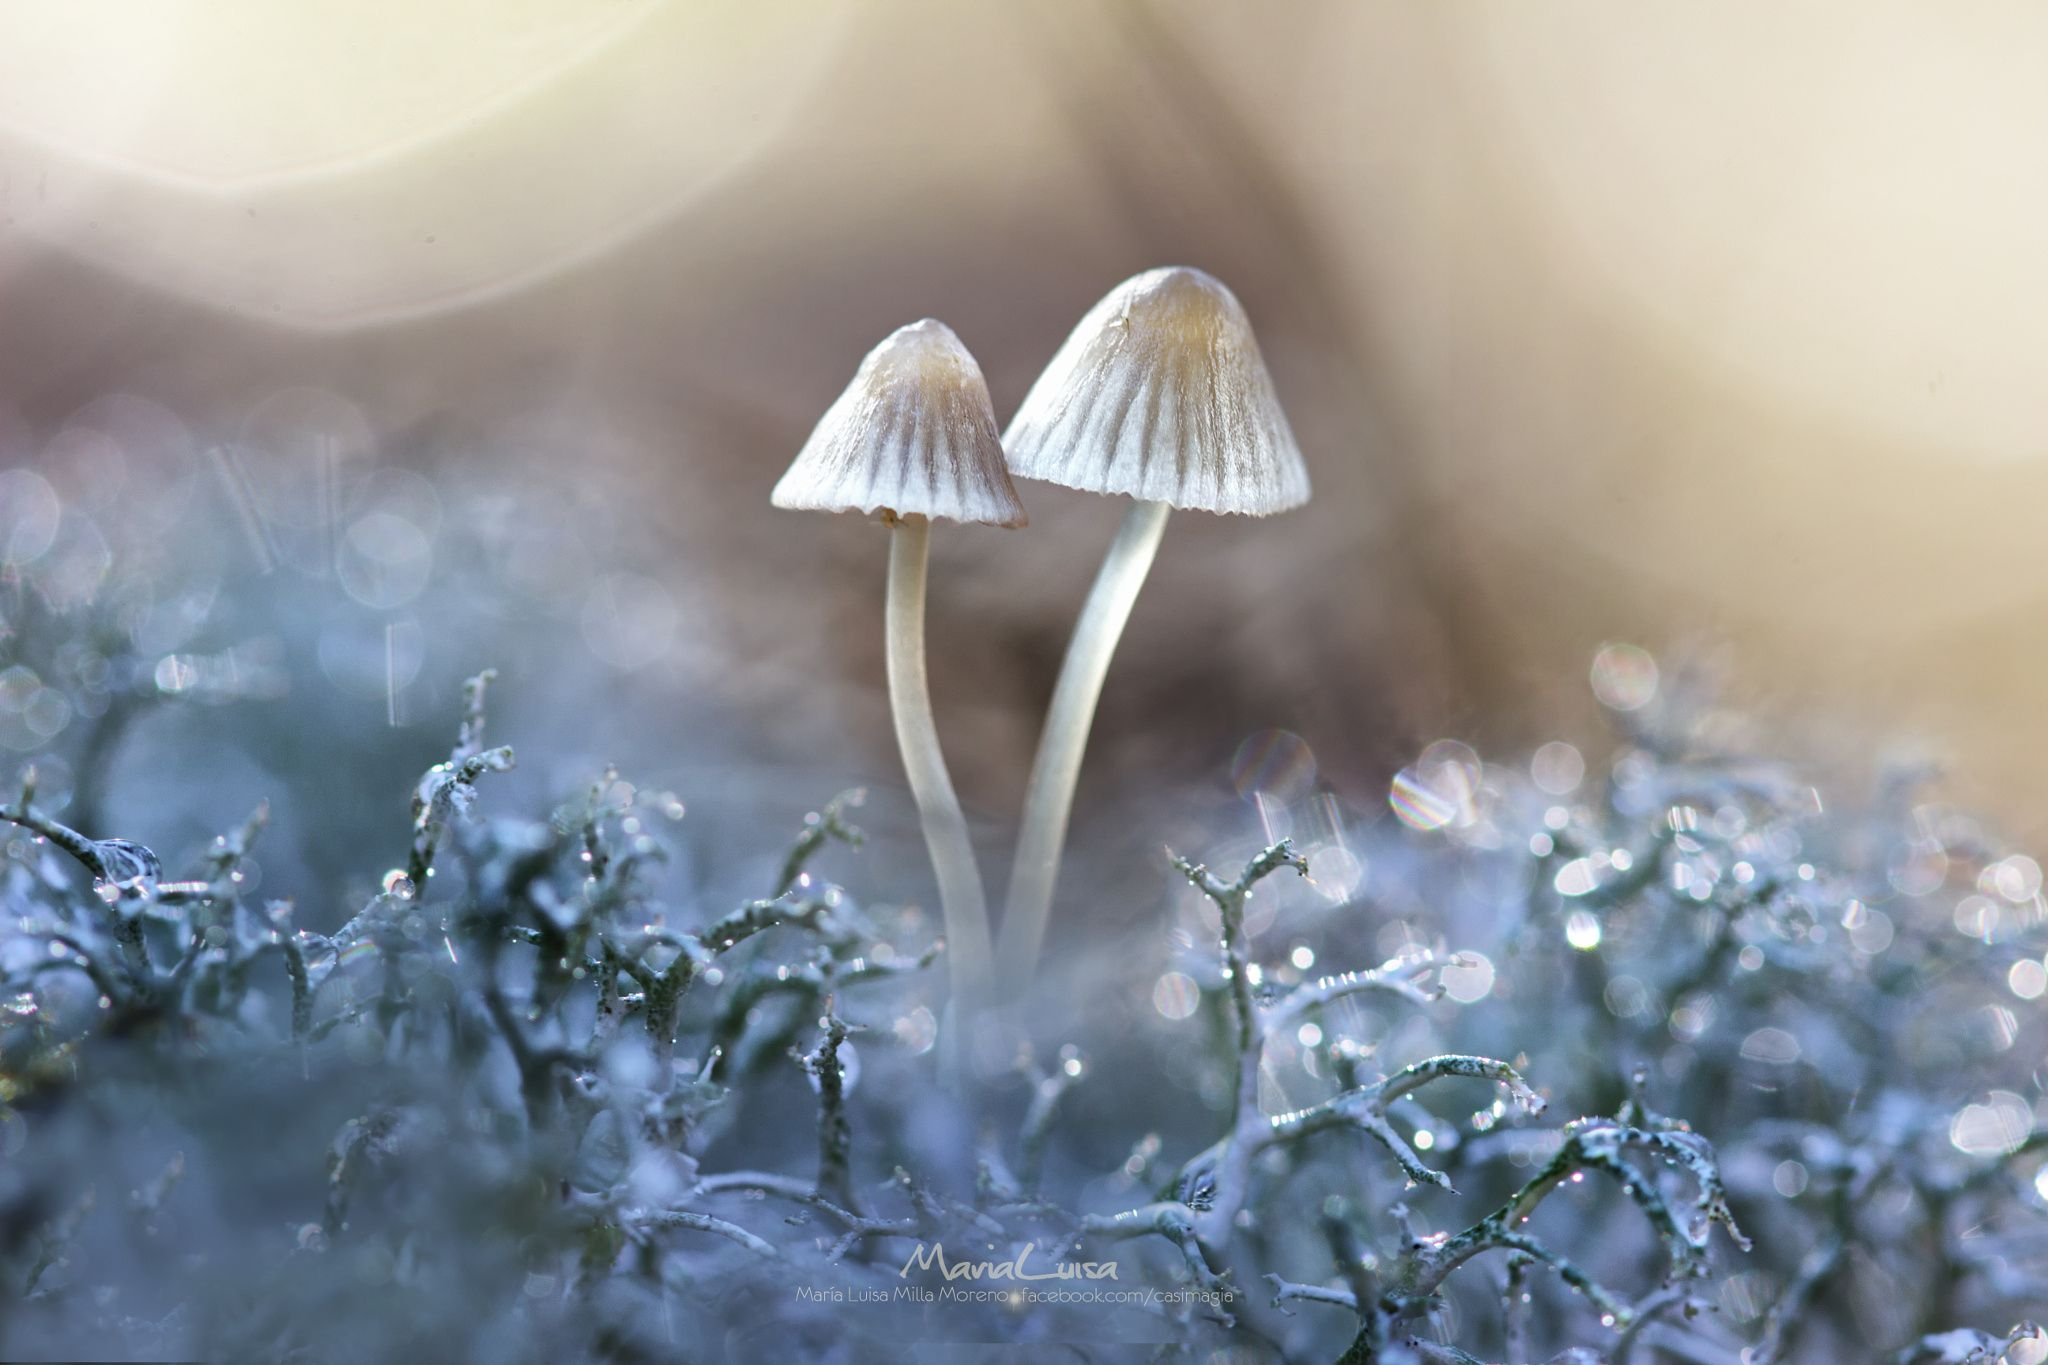 wild mushrooms and lichens